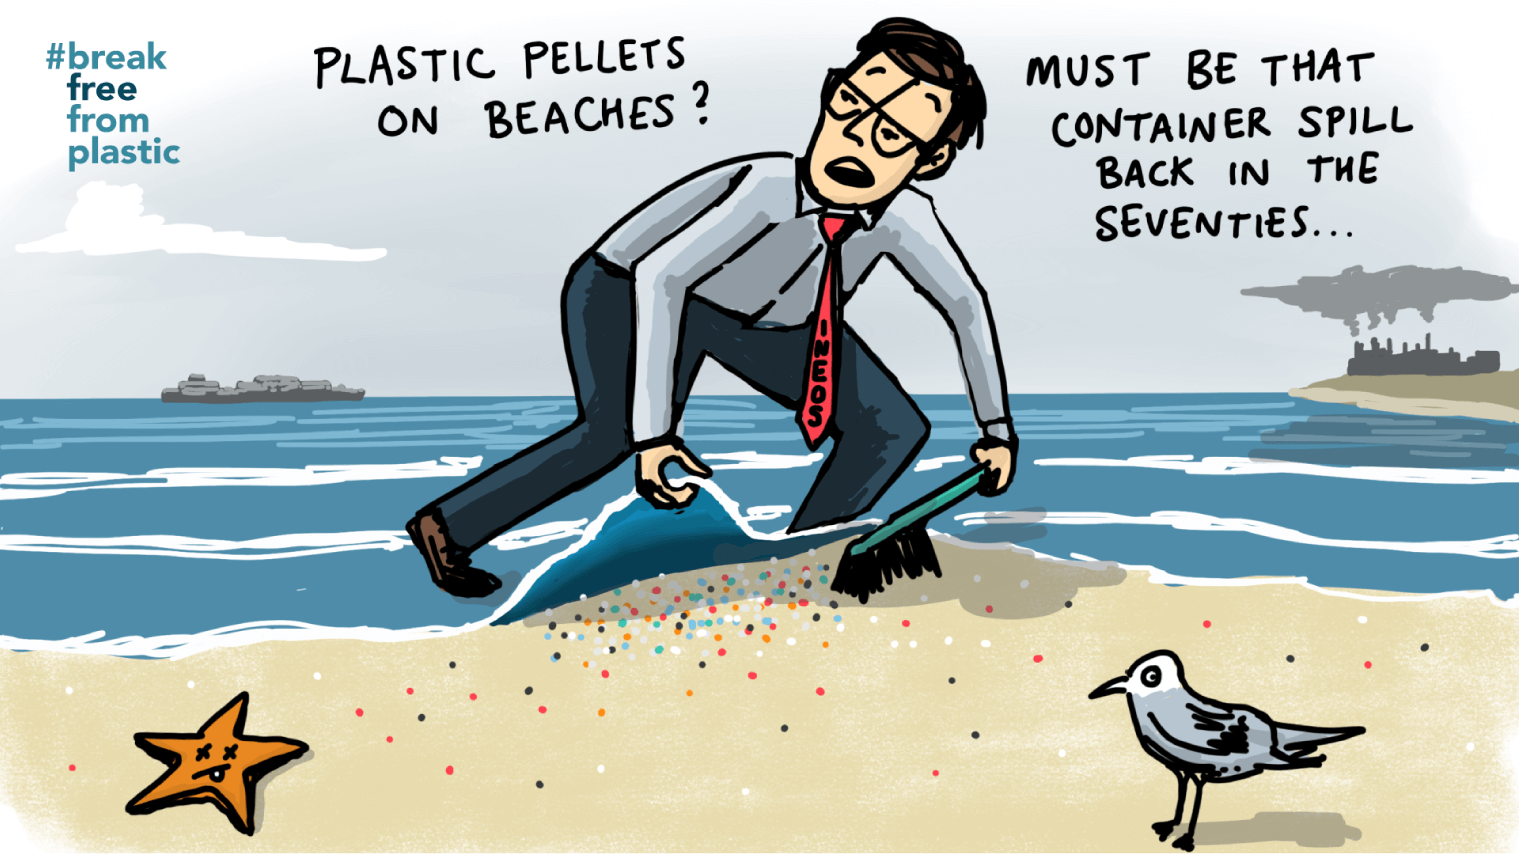 BFFP - Plastic Pellets on Beaches